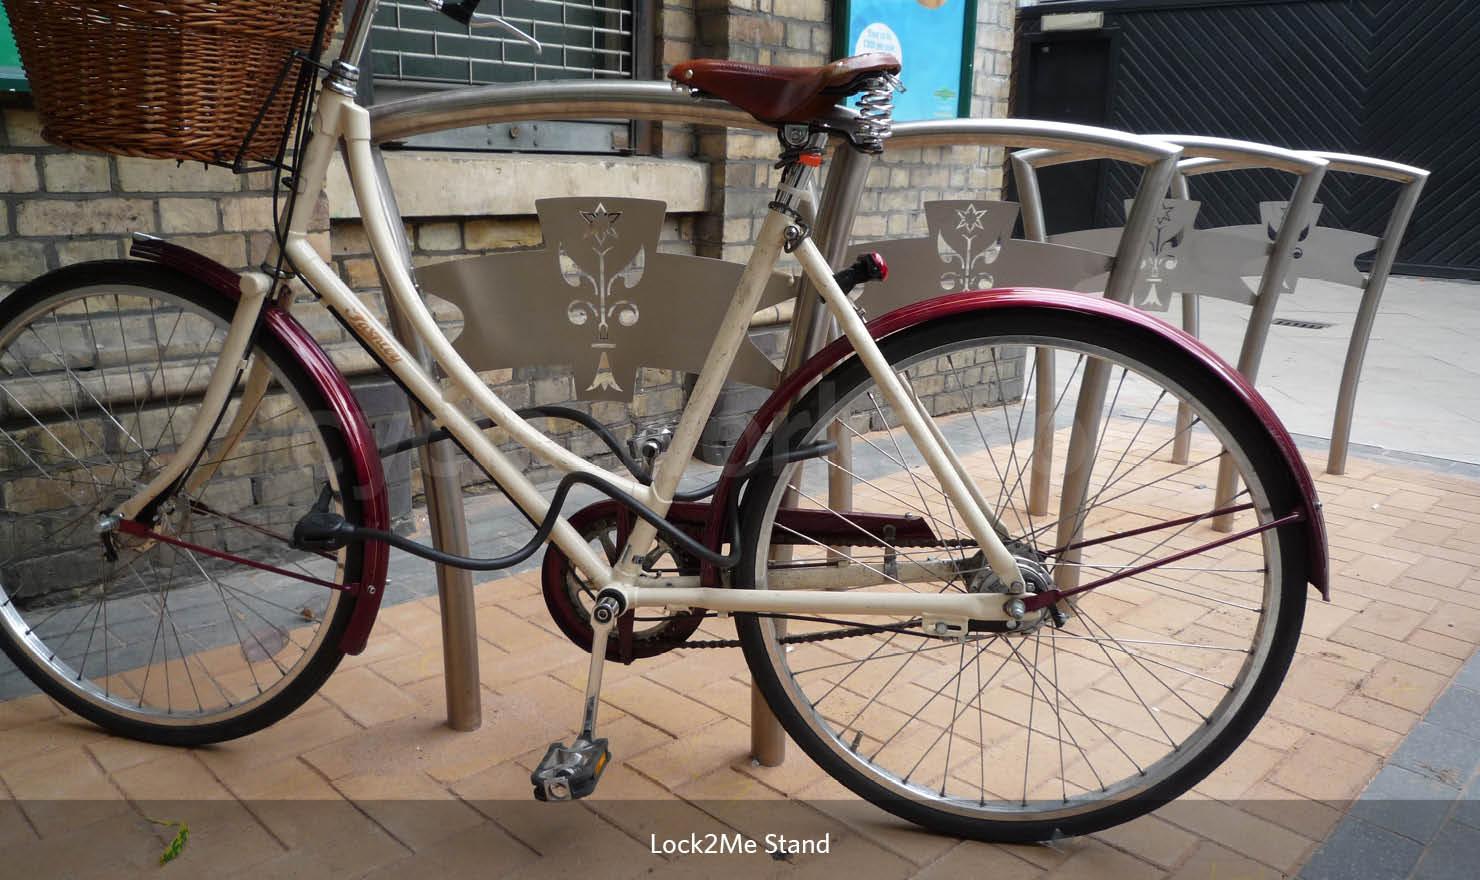 Lock 2 Me Bike Rack